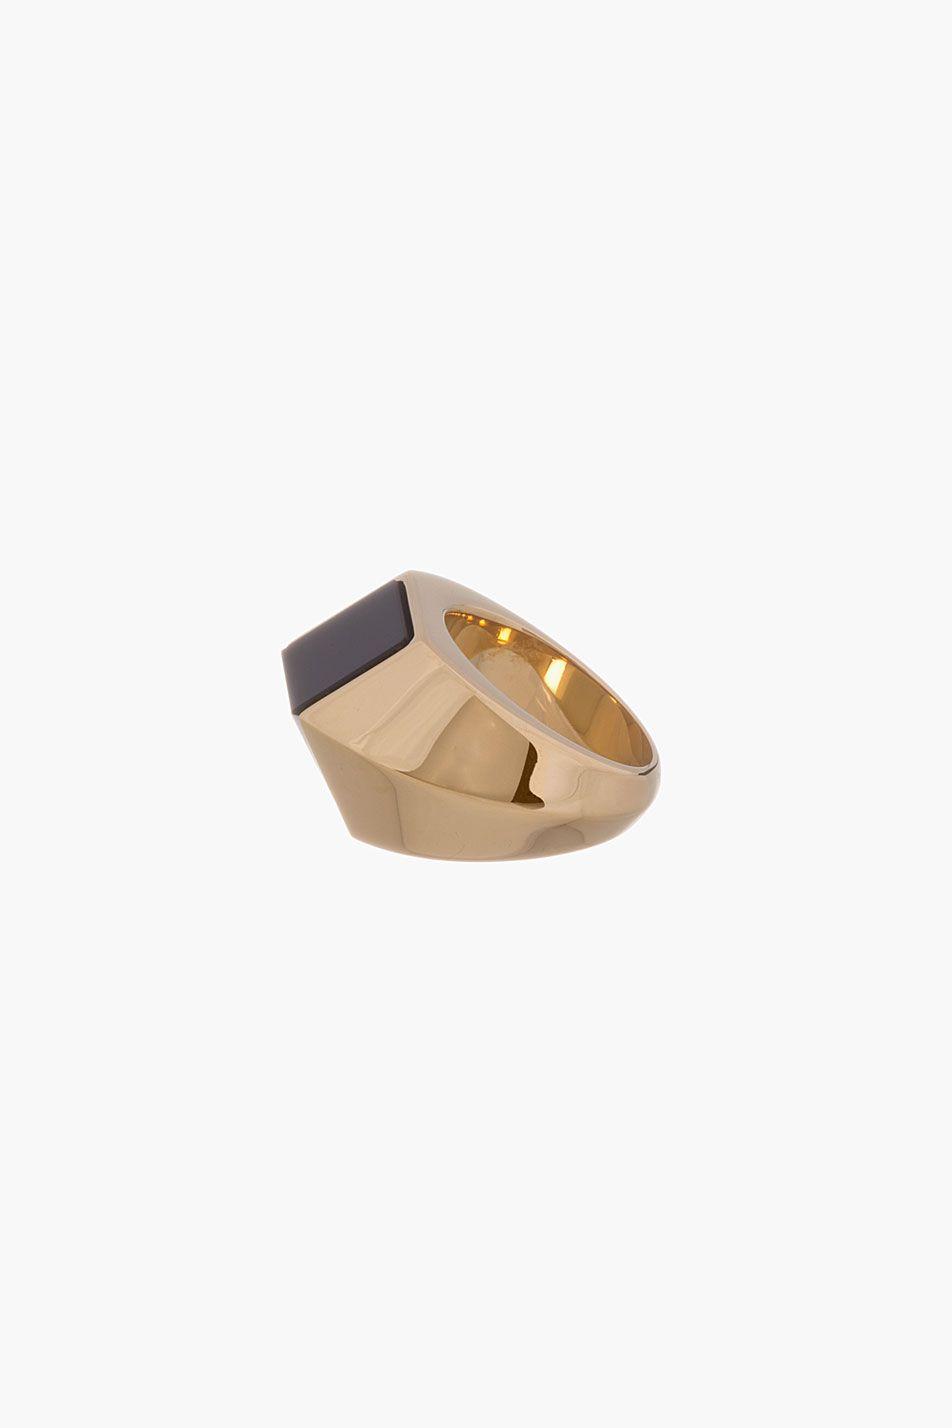 Saint laurent black u white opium ring modern jewels pinterest